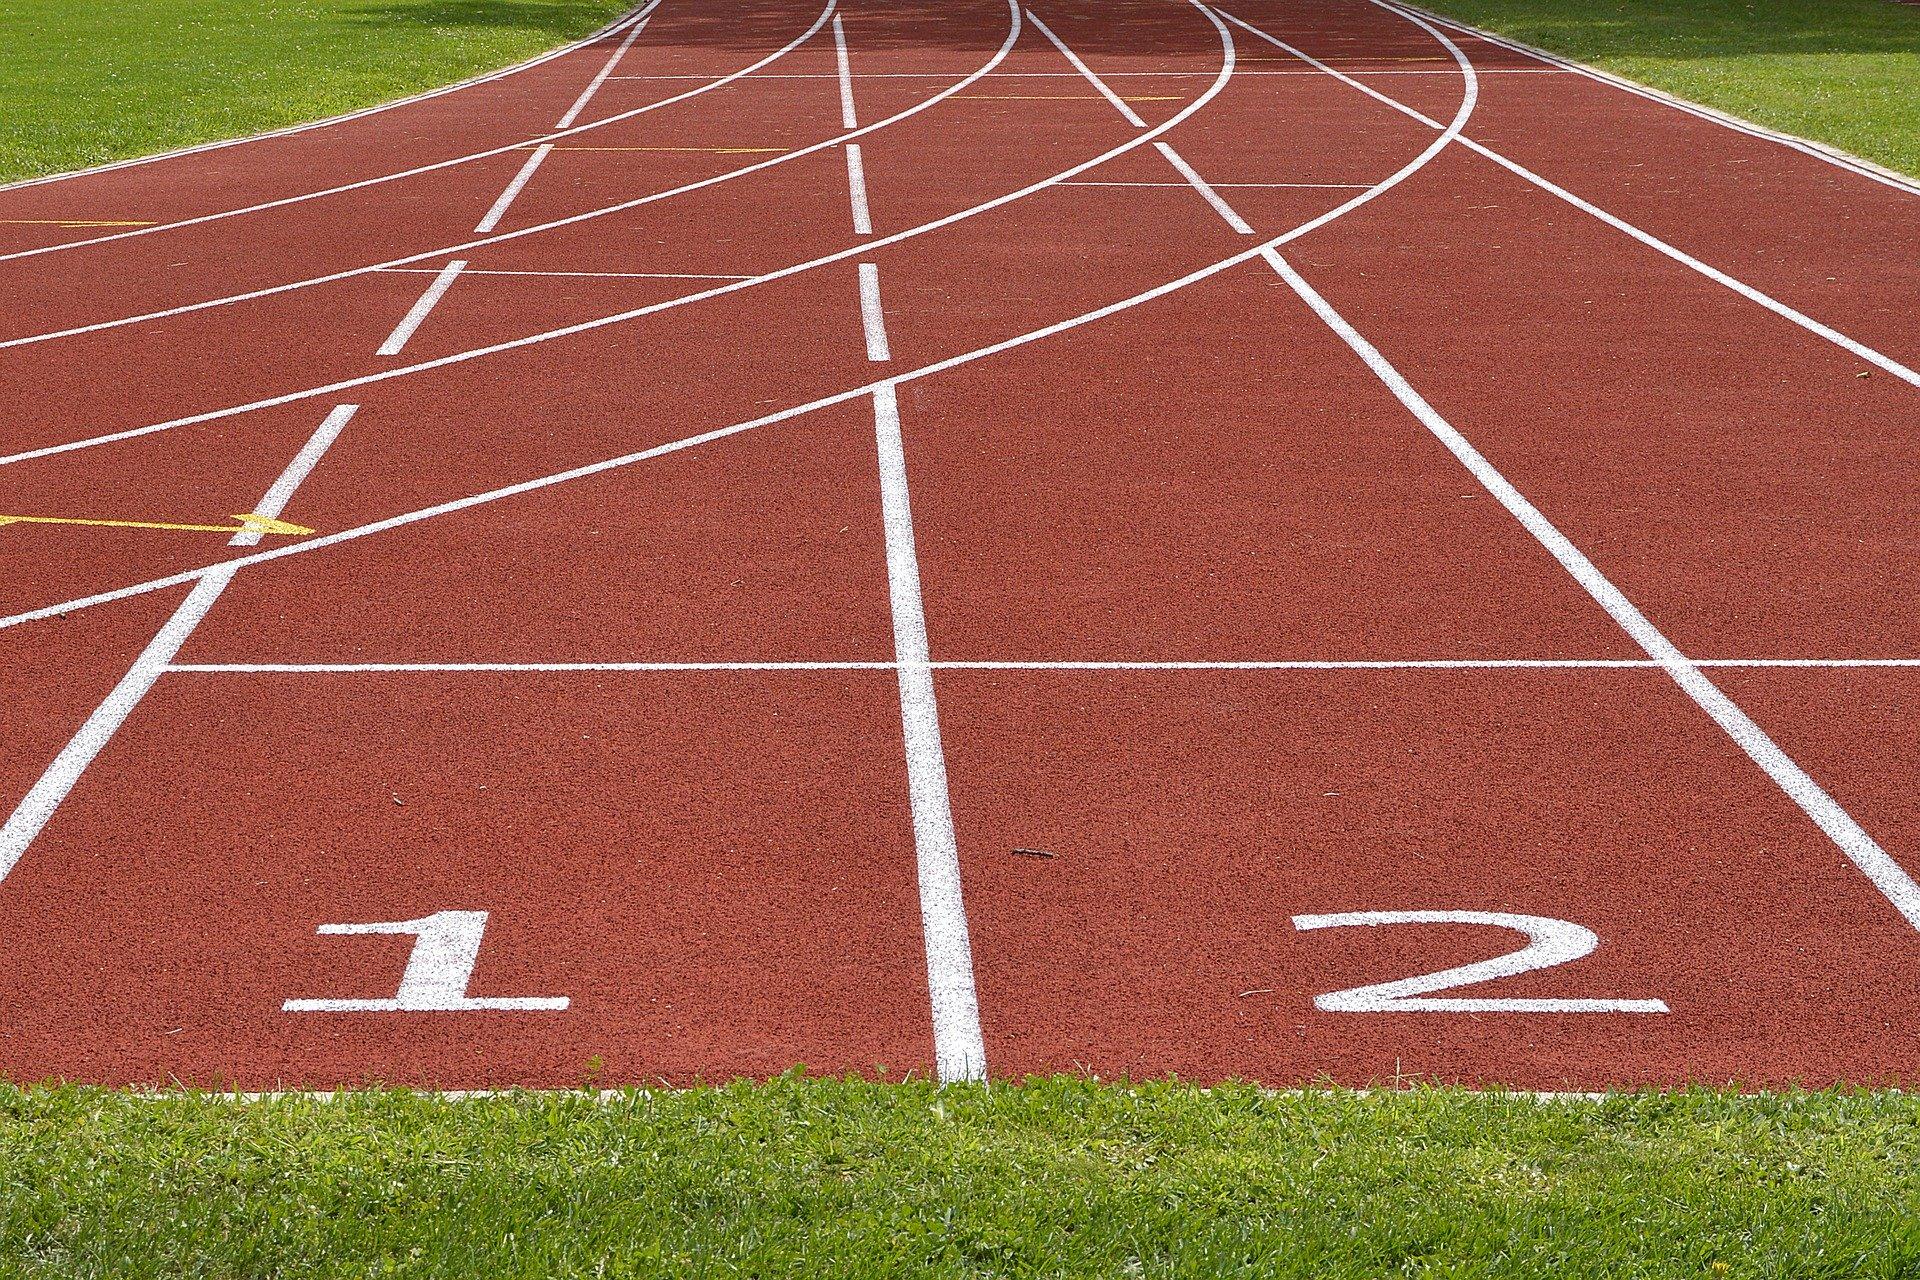 Power-based interval training